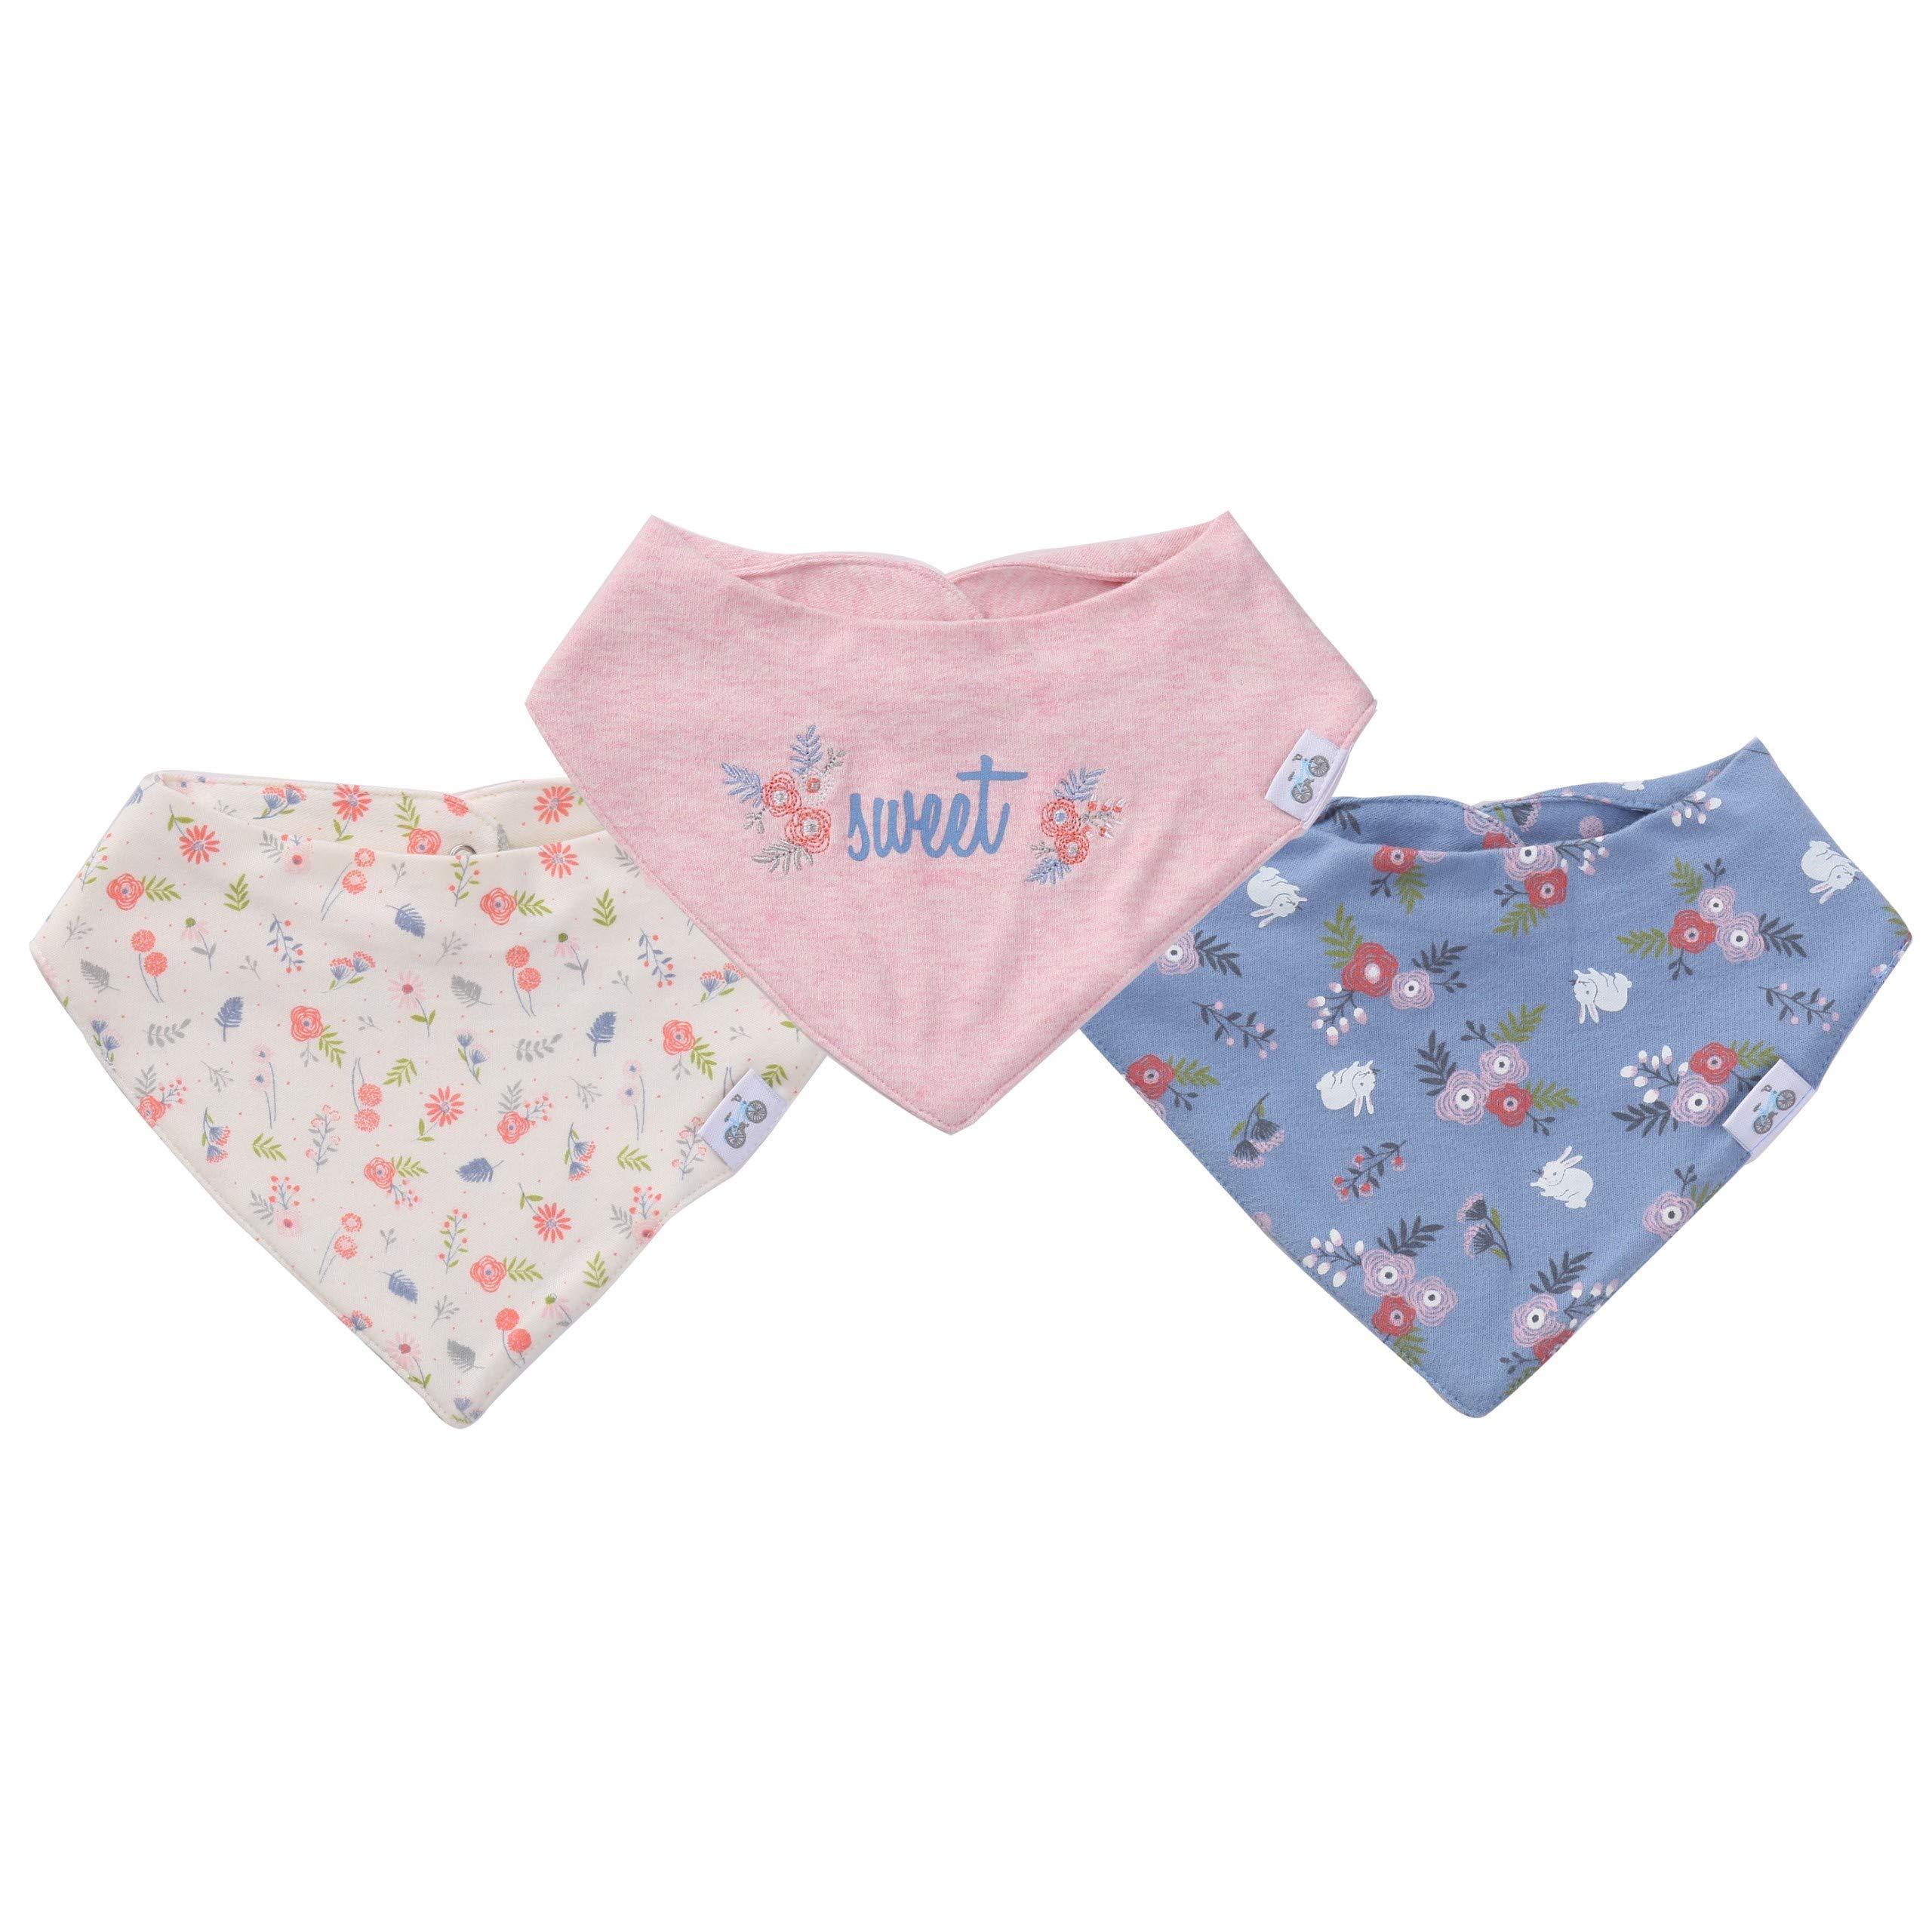 Bandana Drool Girls Bibs – 3 Pc Infant and Newborn Burp Drool Bib Shower Gifts